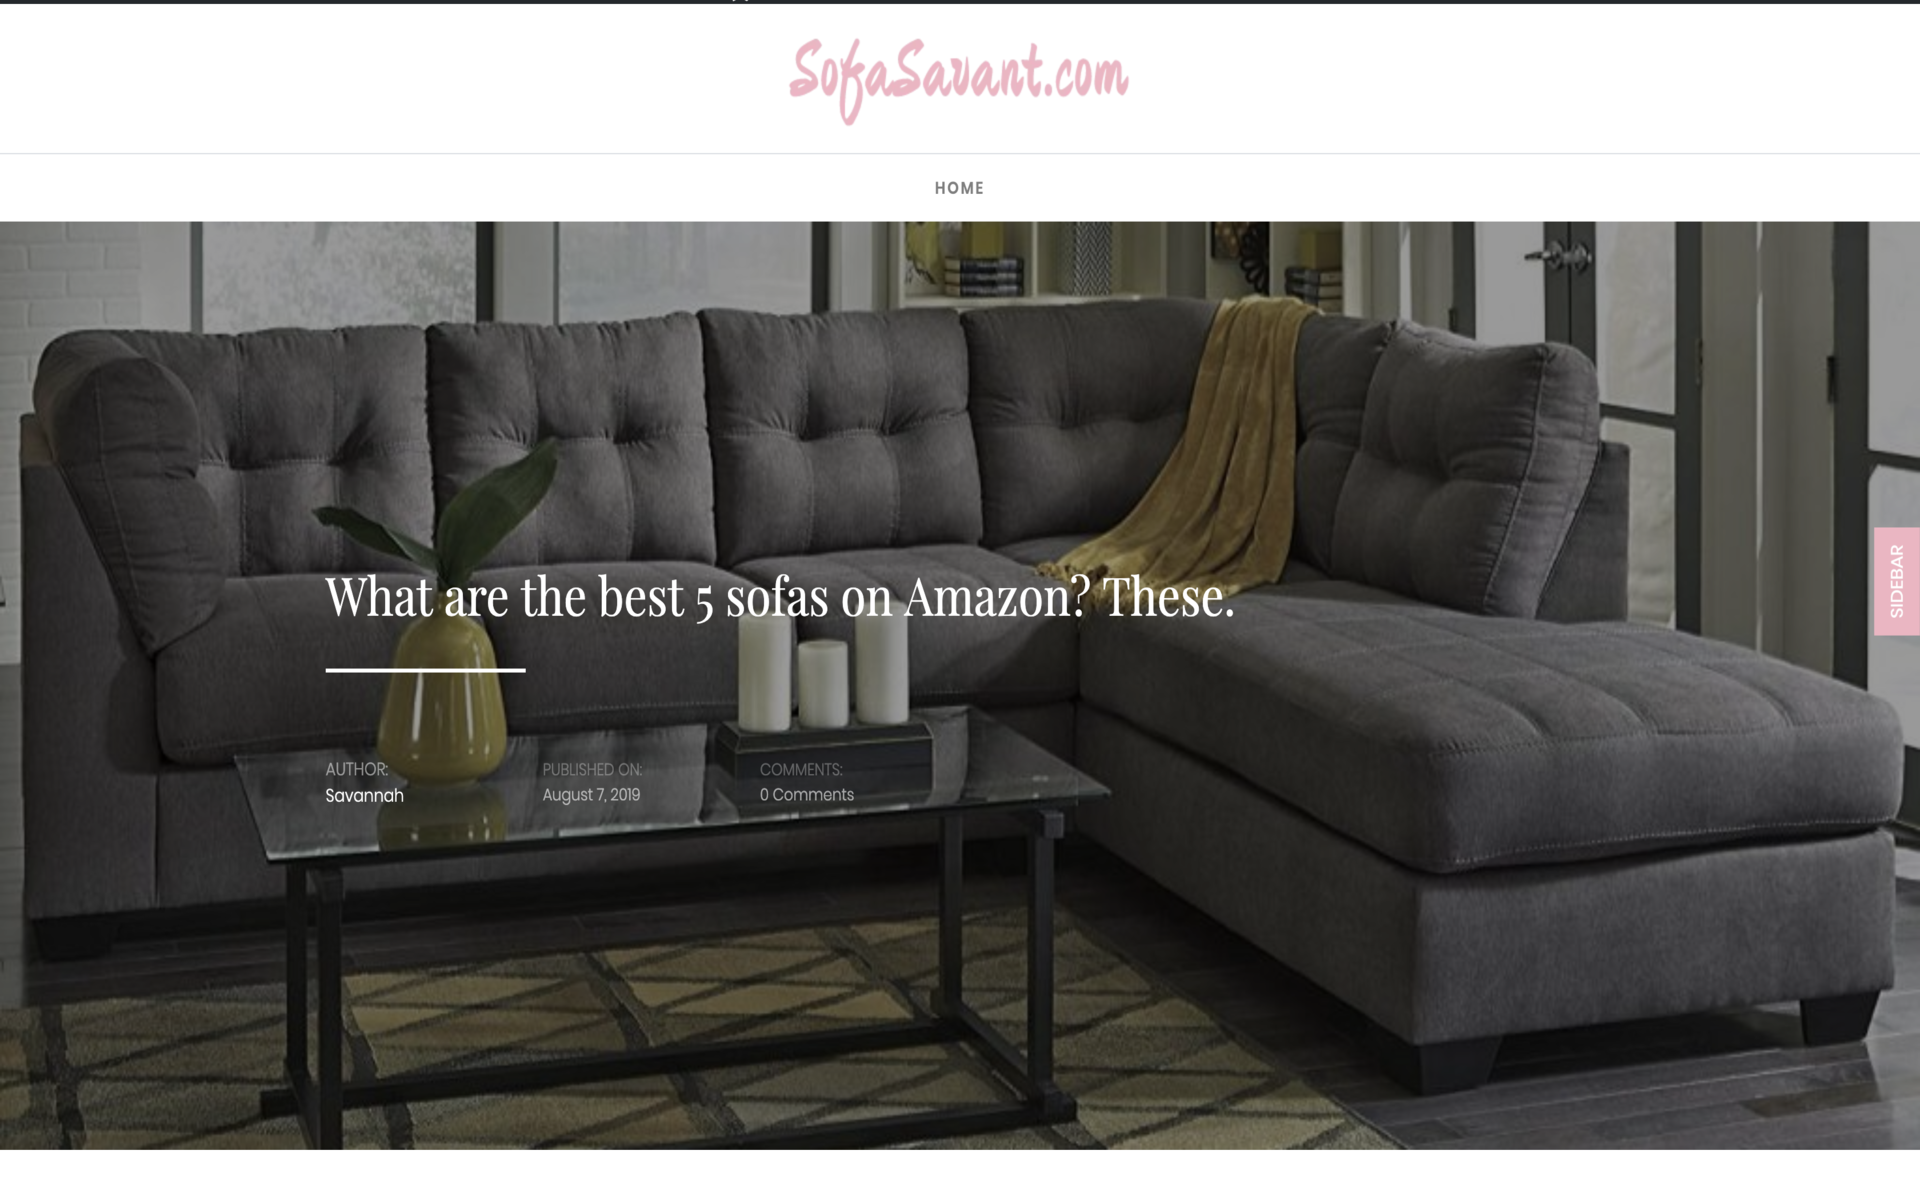 Sofa Savant: Amazon.es: Appstore para Android